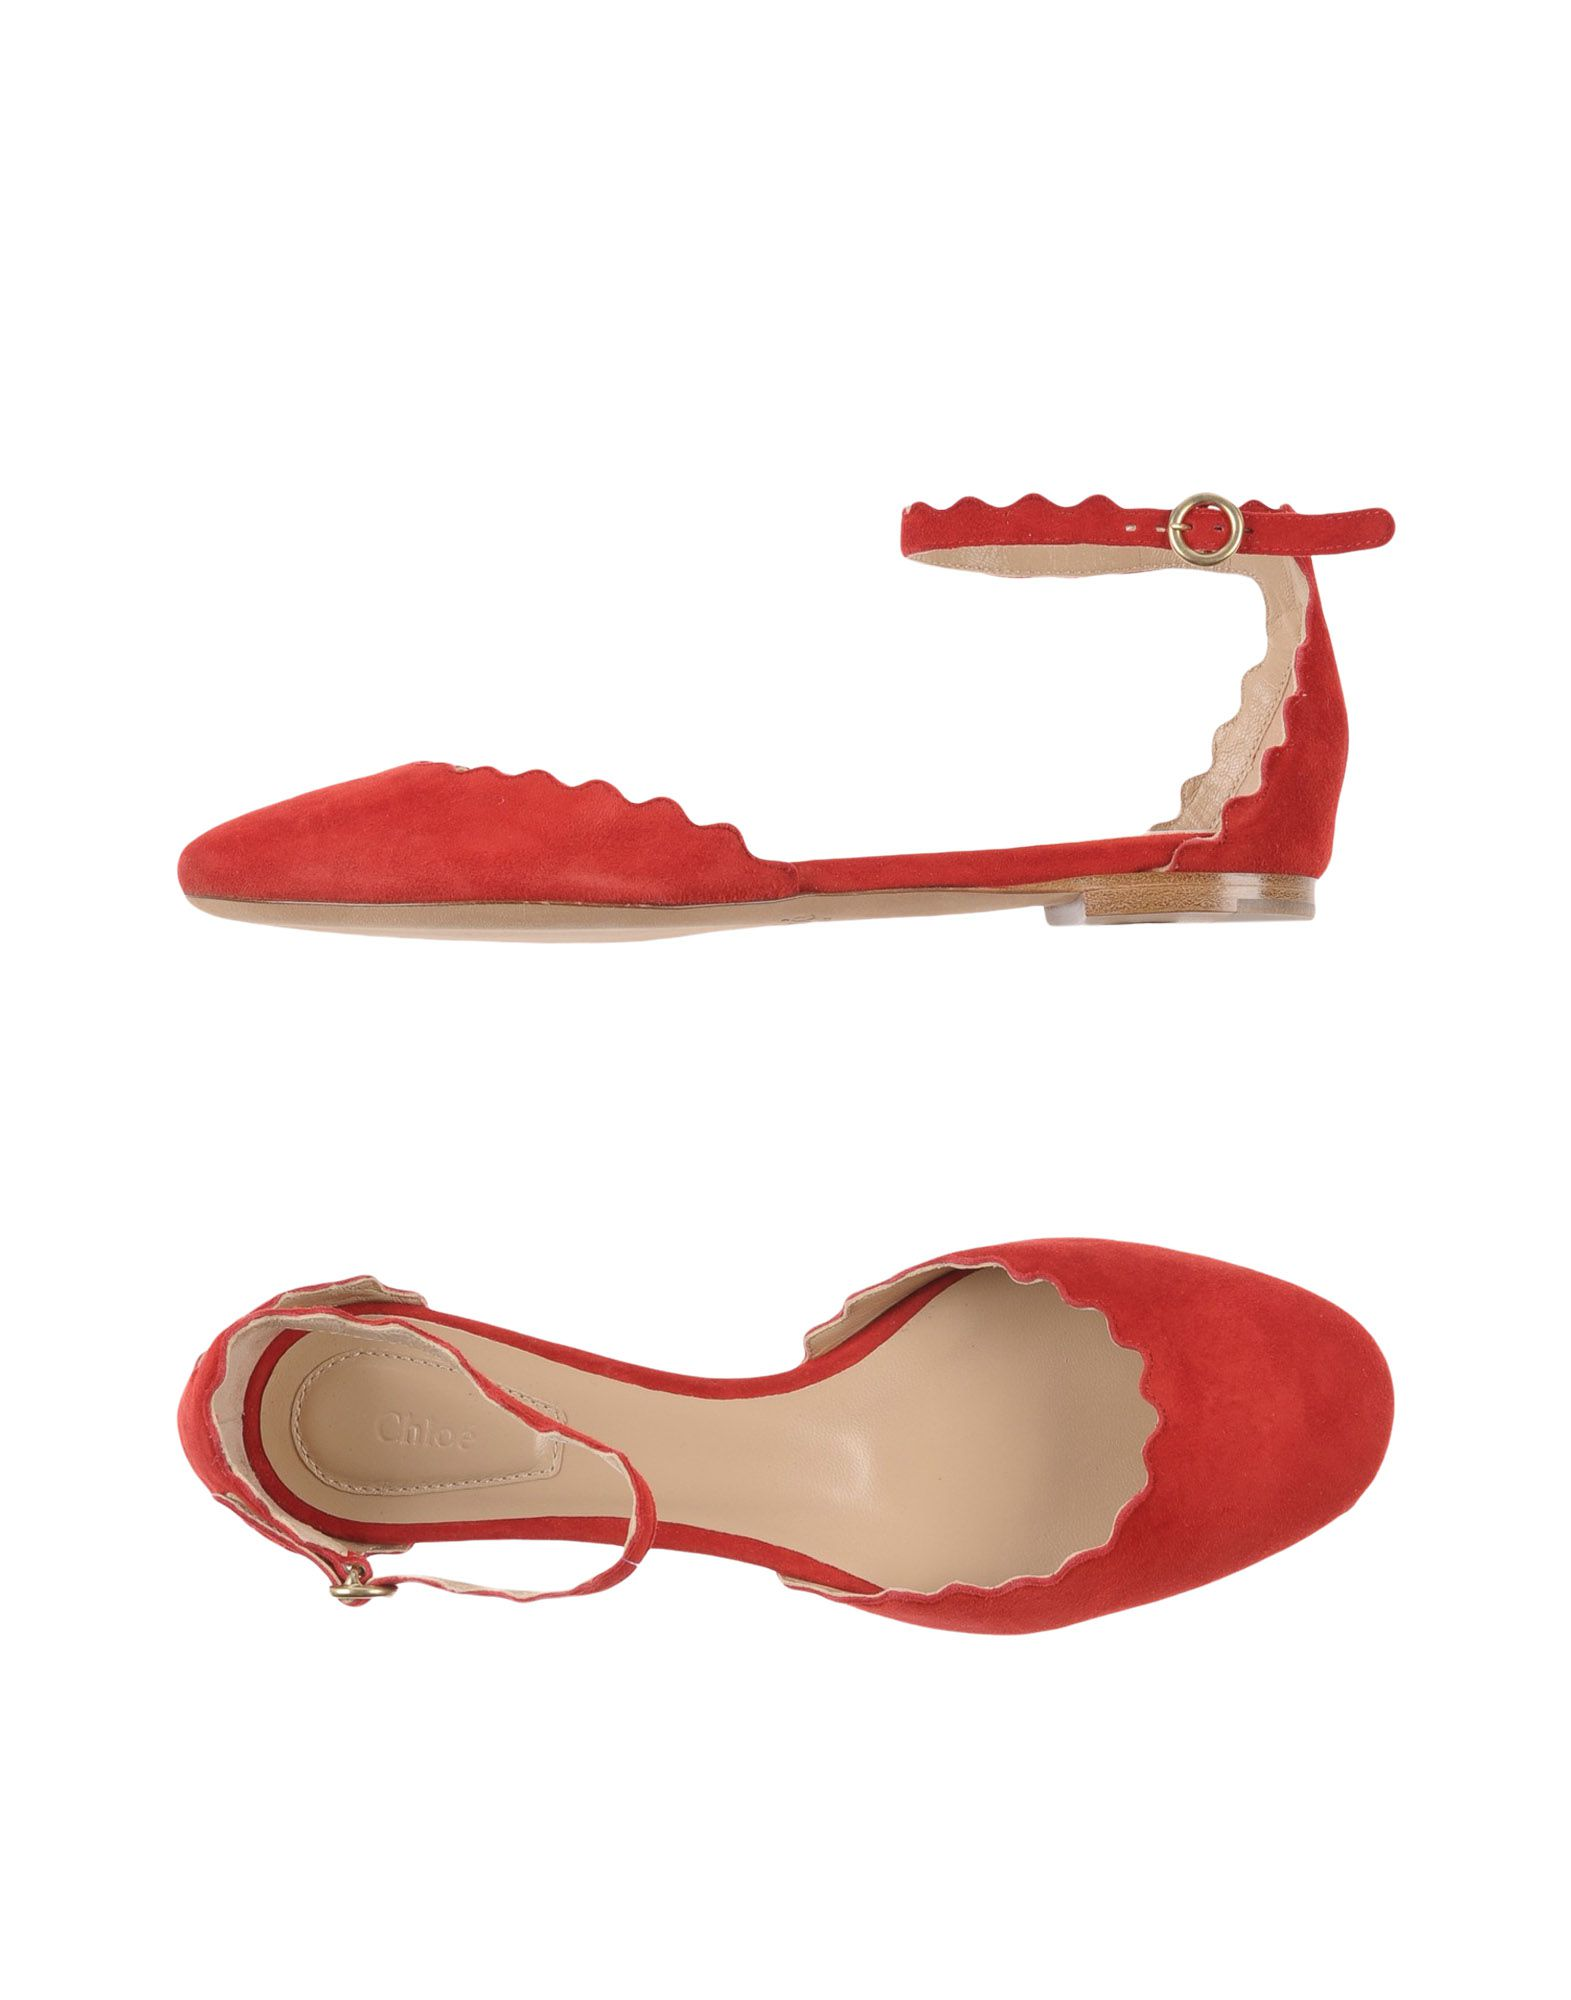 Rabatt Rabatt Rabatt Schuhe Chloé Ballerinas Damen  11449017OV c14da0